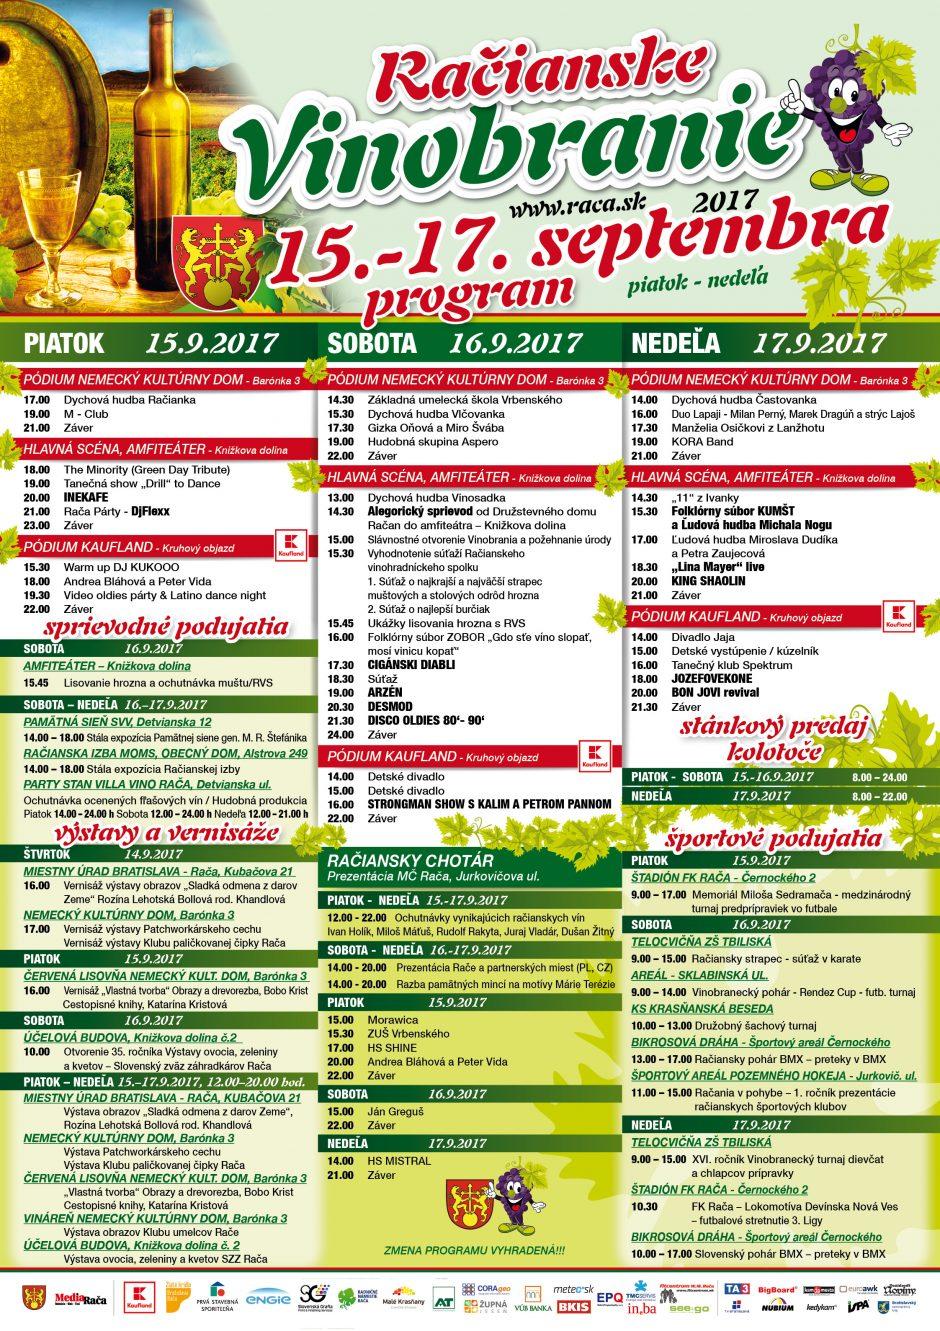 Račianske vinobranie 2017